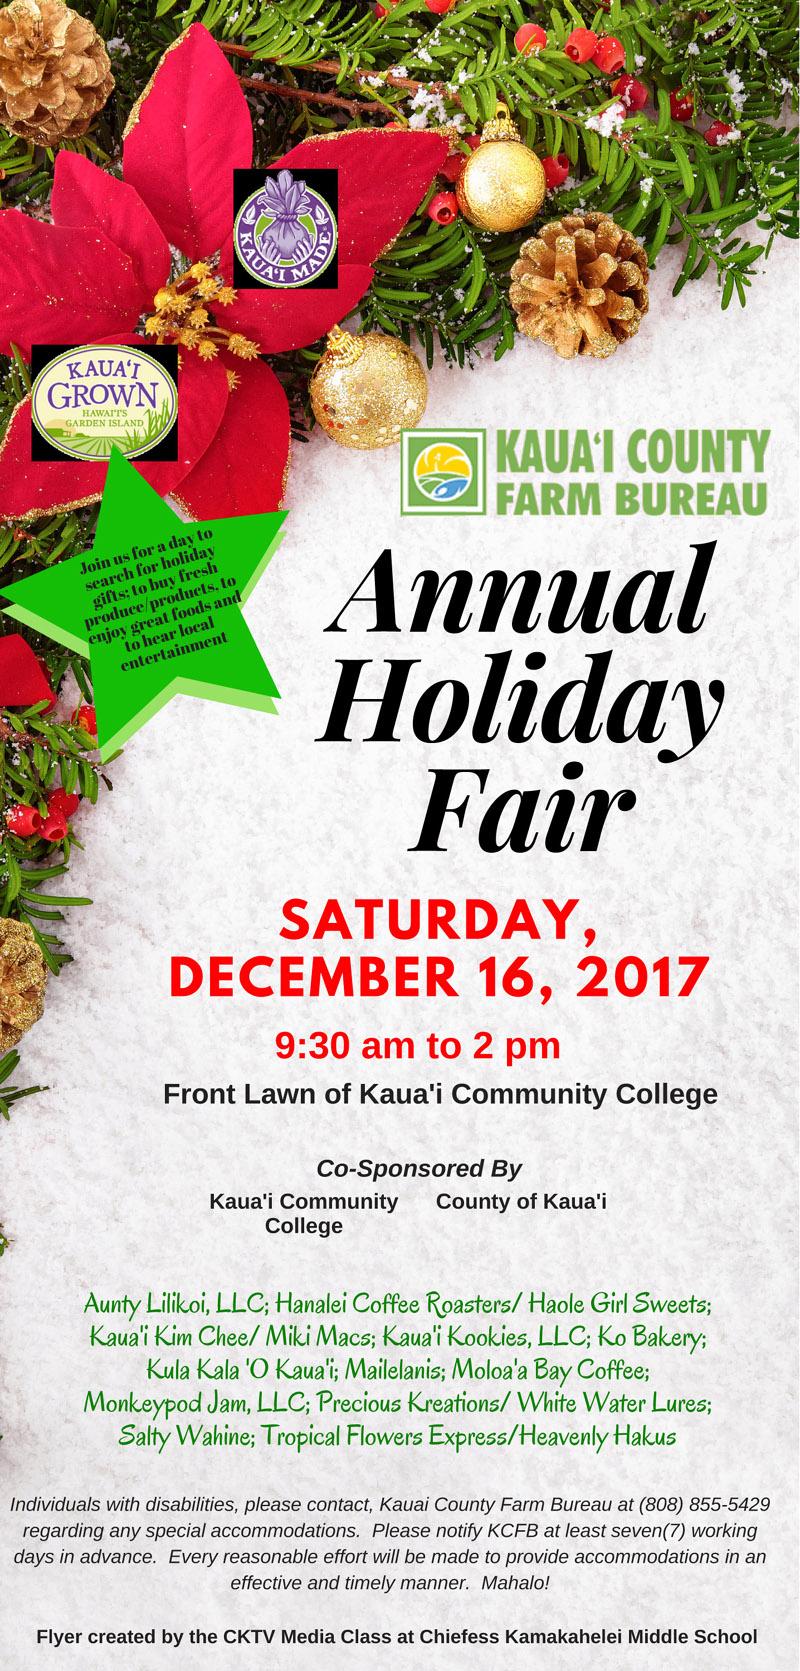 Christmas Craft Show Flyer.Holiday Market And Craft Fair At Kauai Community Market A